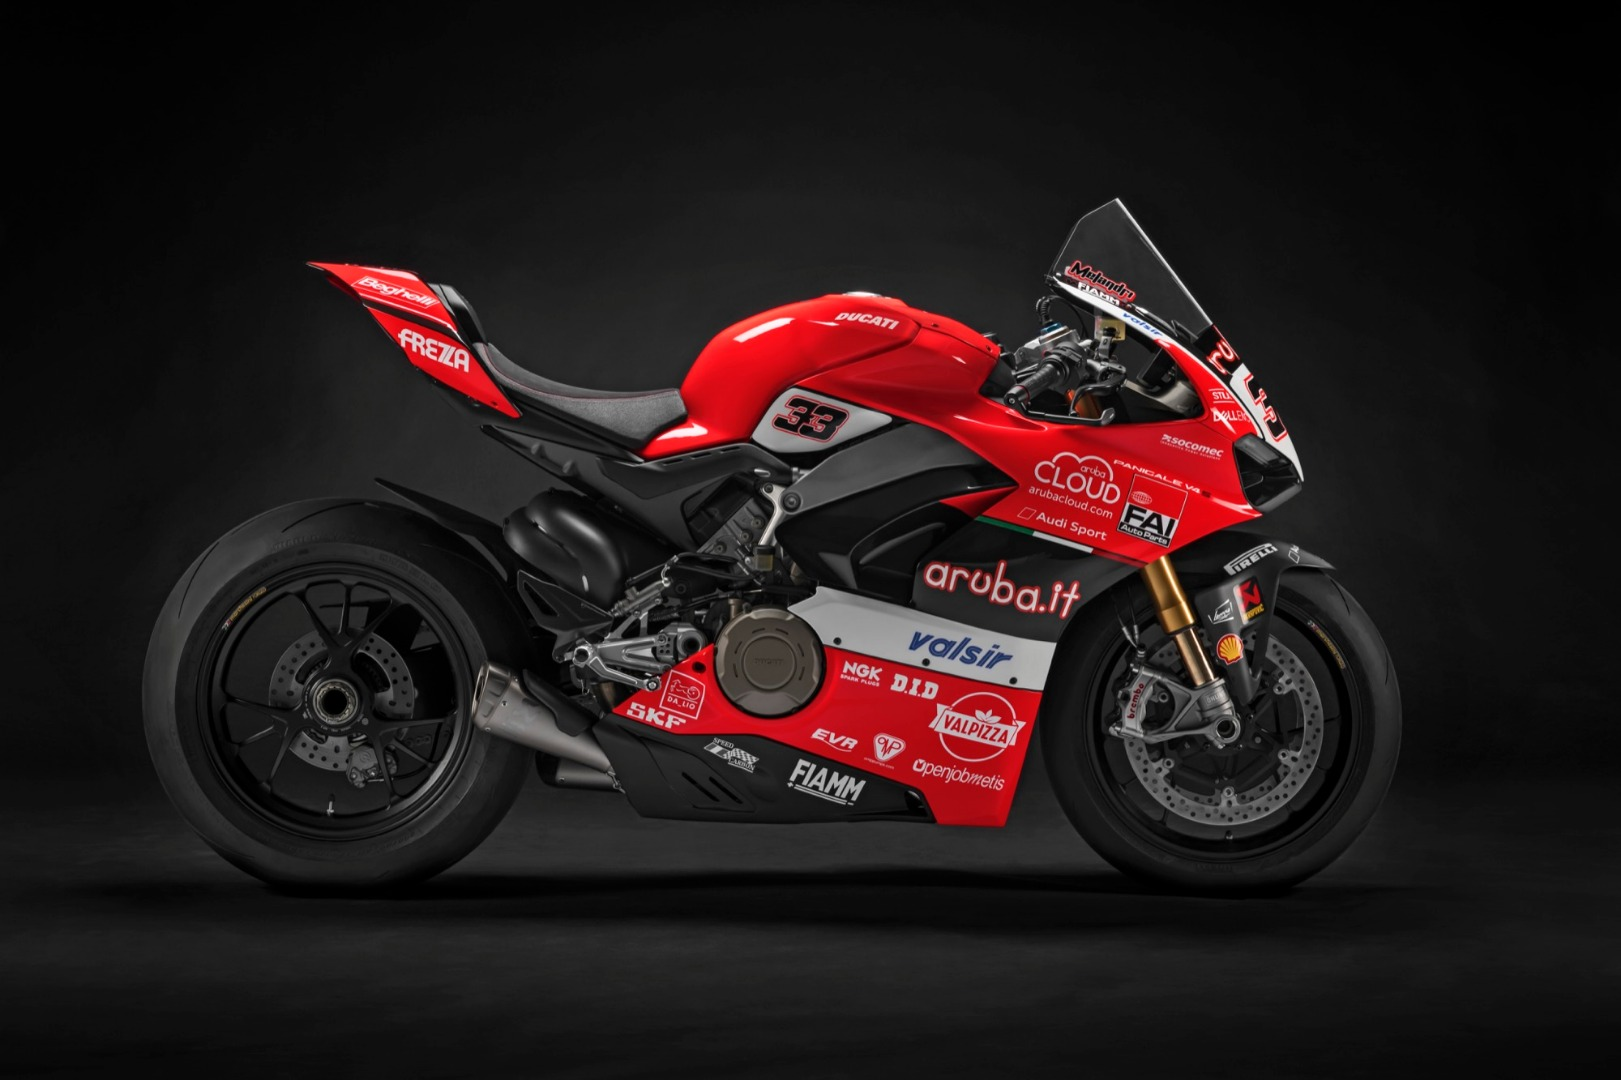 Ducati V4 Panigale Marco Melandri